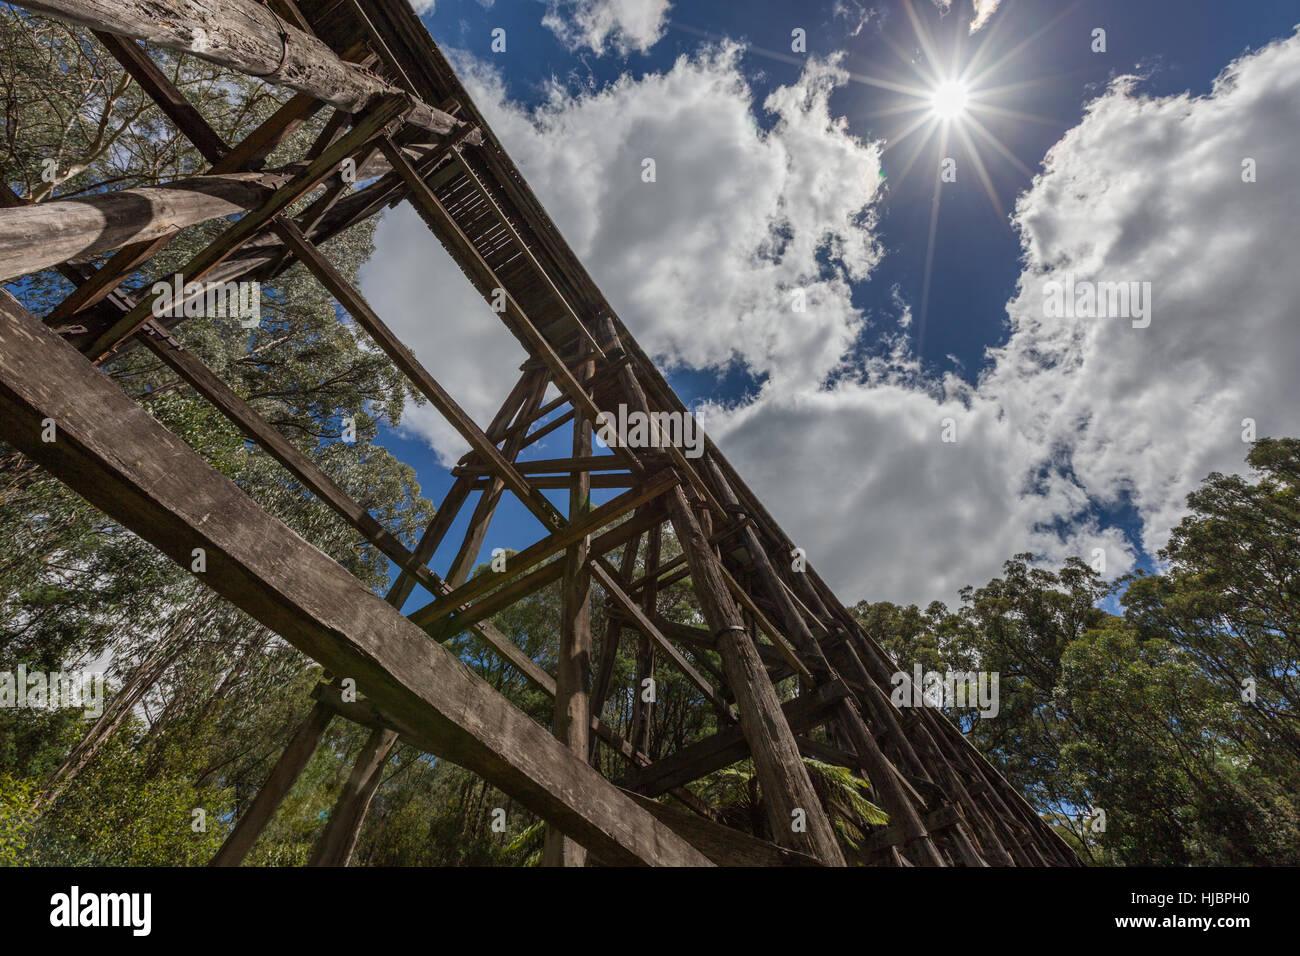 Old trestle bridge on hot summer day in Australia - Stock Image